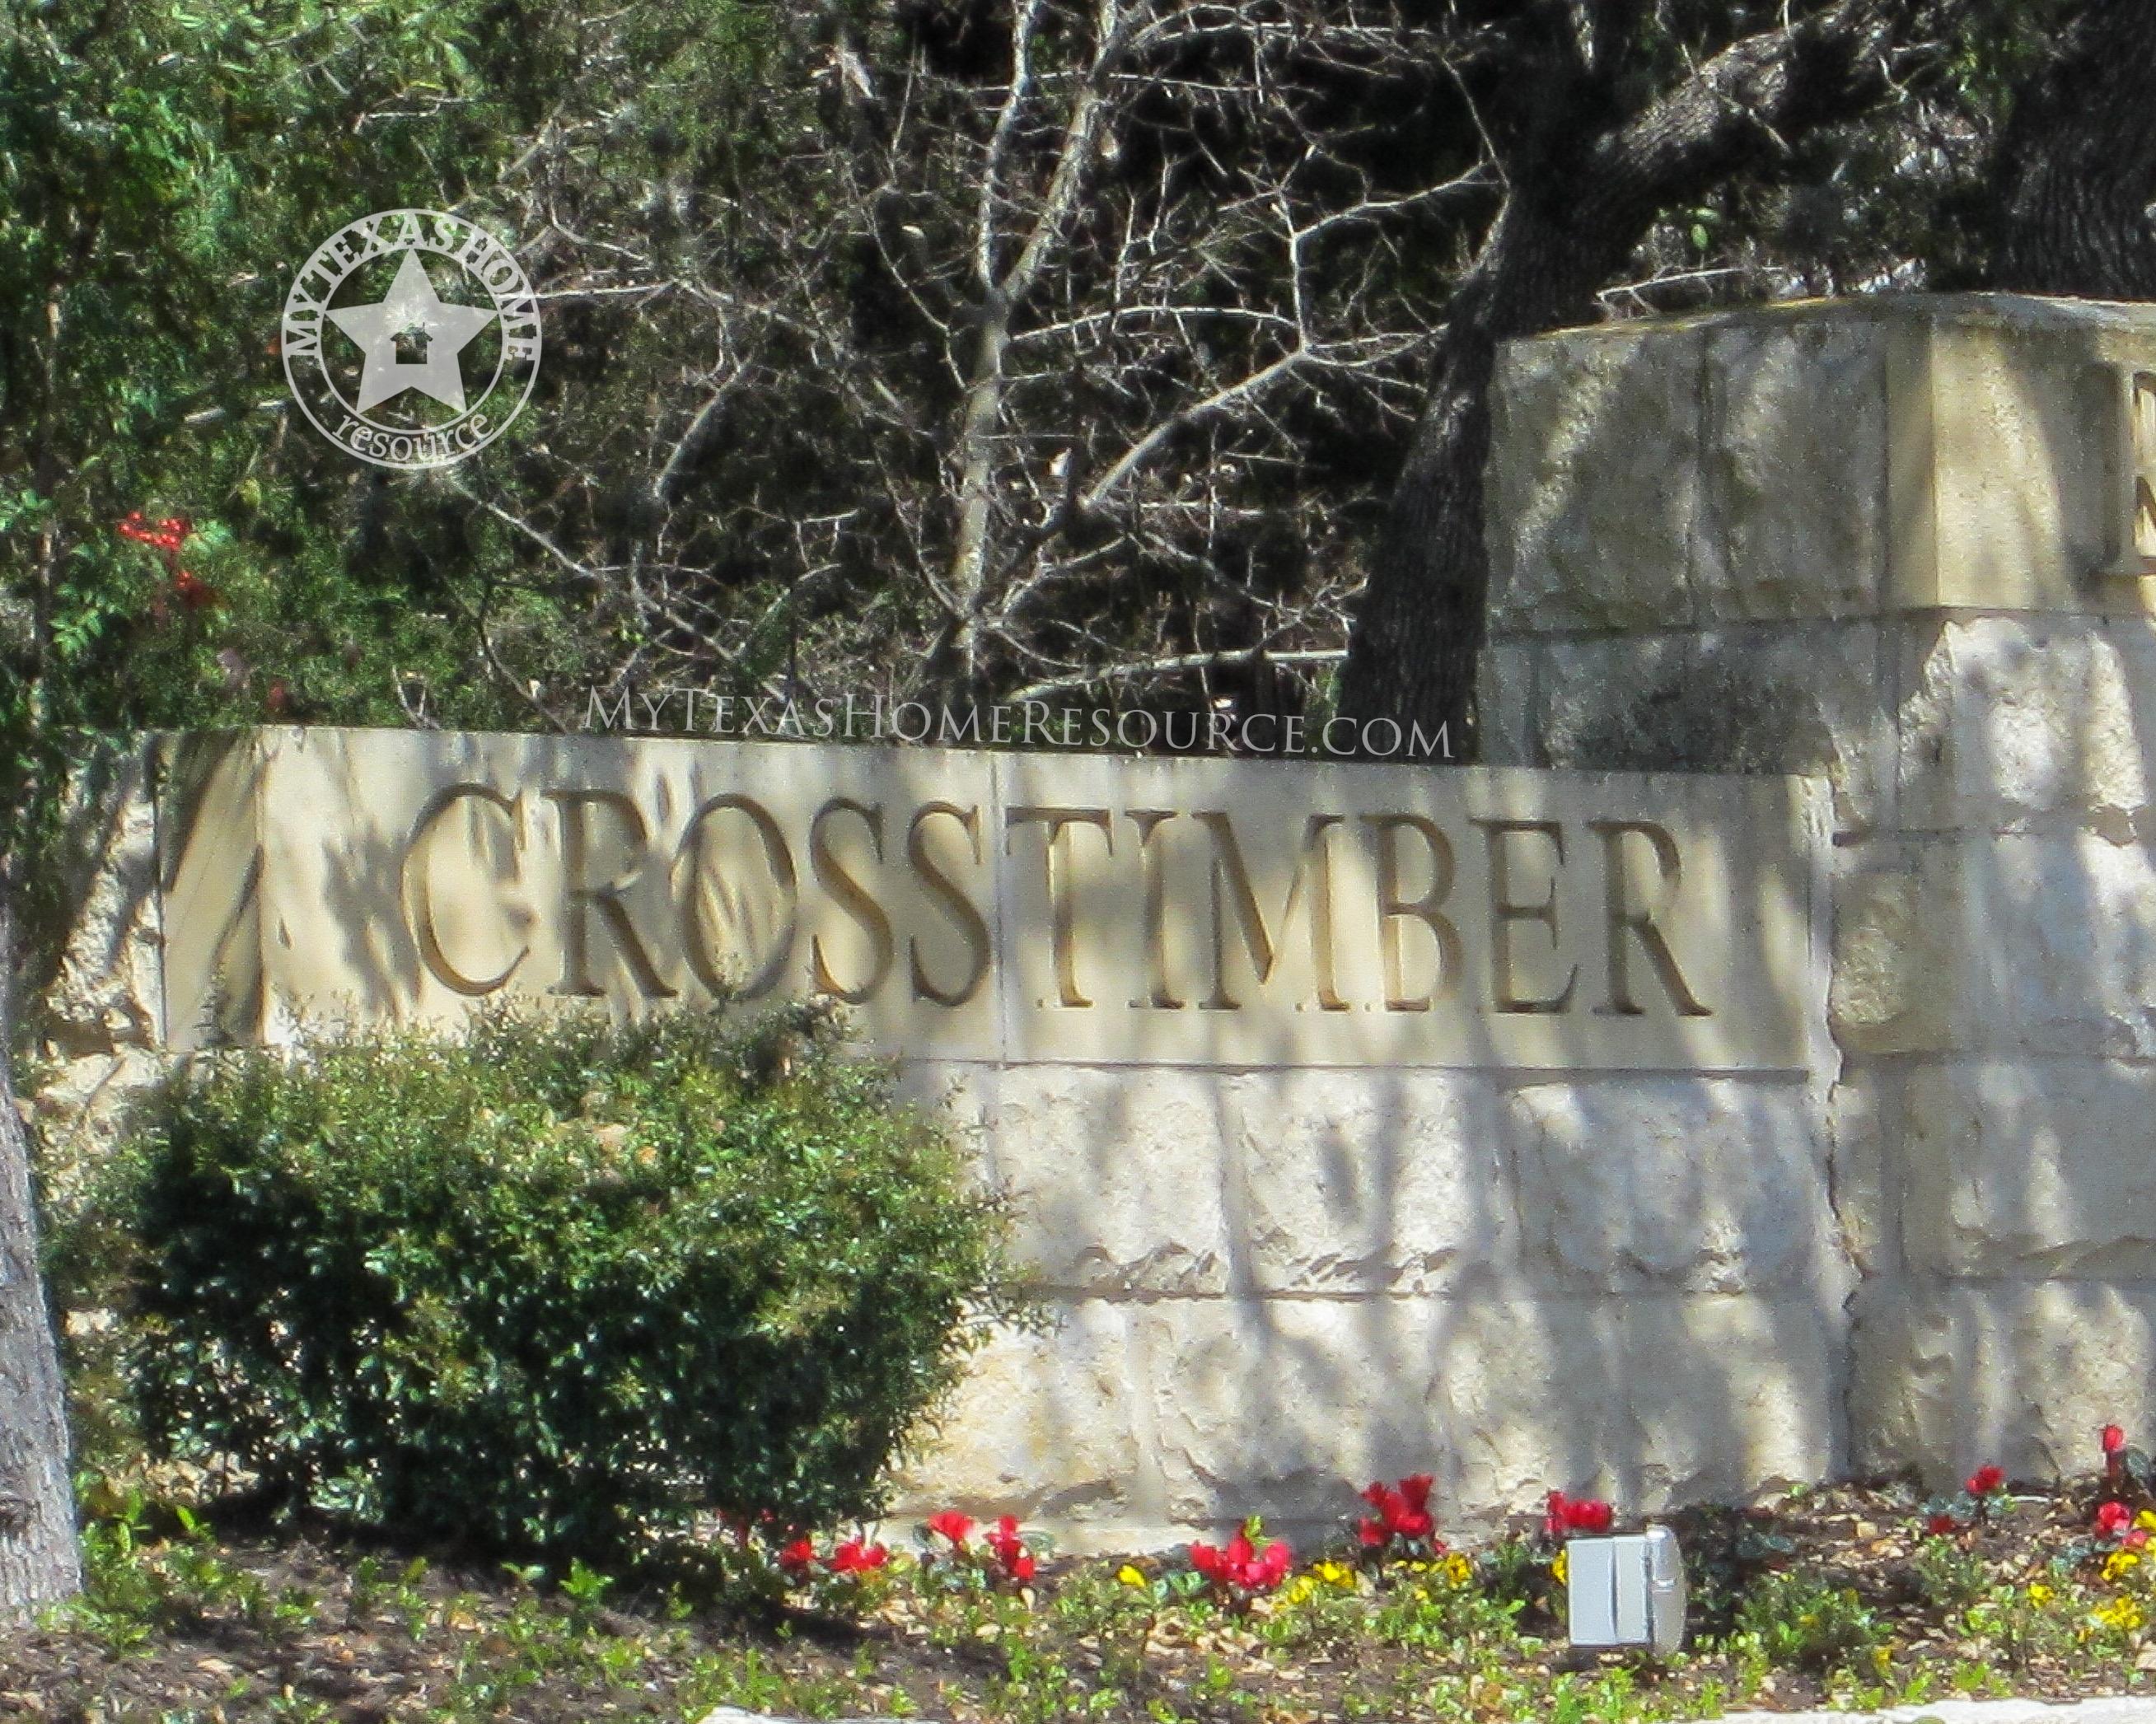 Crosstimber Community San Antonio, TX